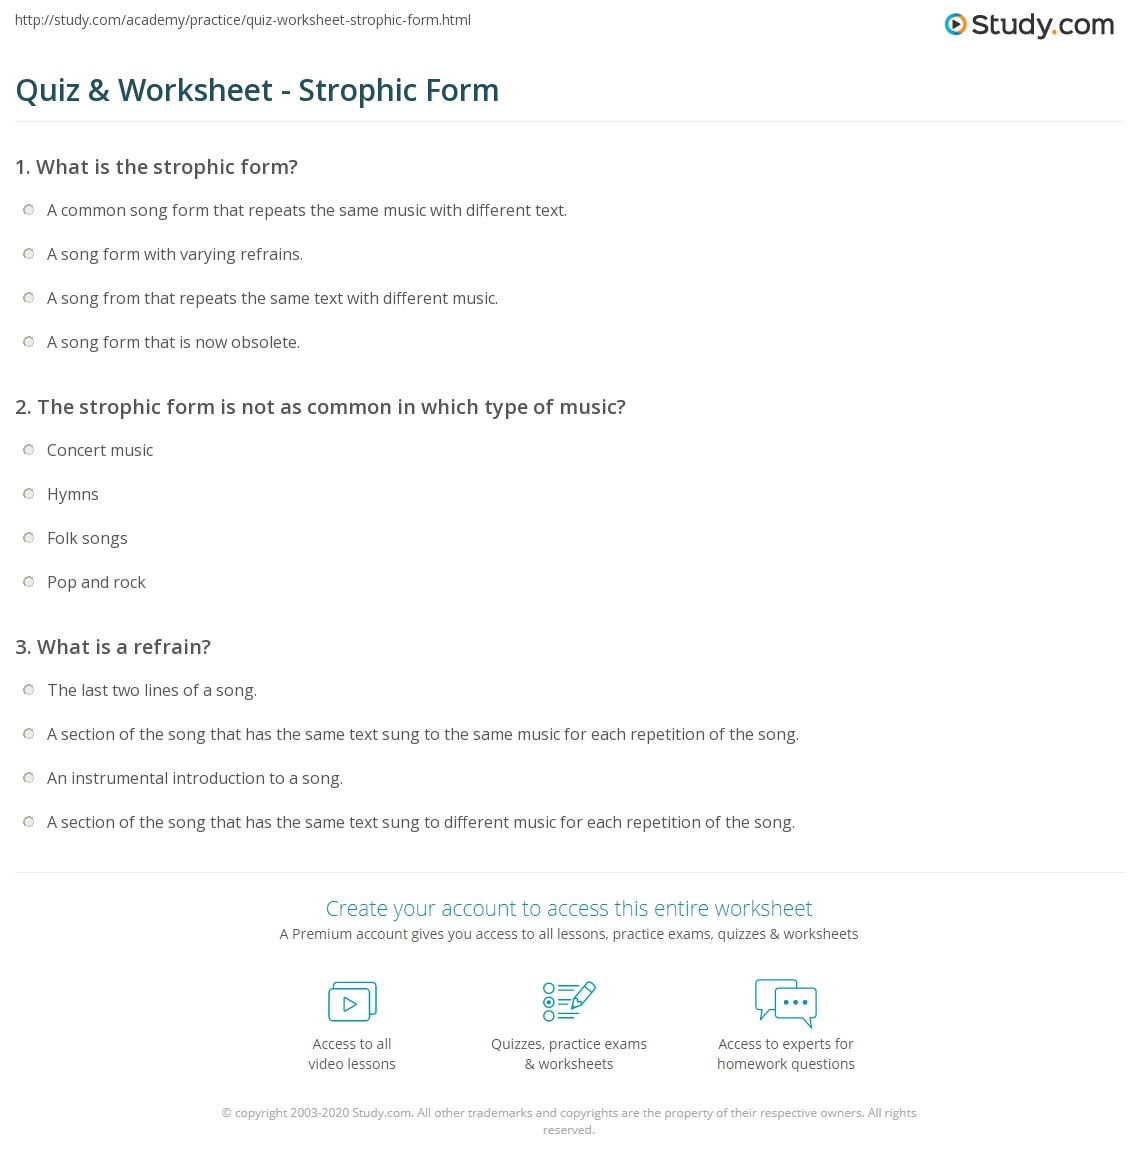 Quiz & Worksheet - Strophic Form | Study.com